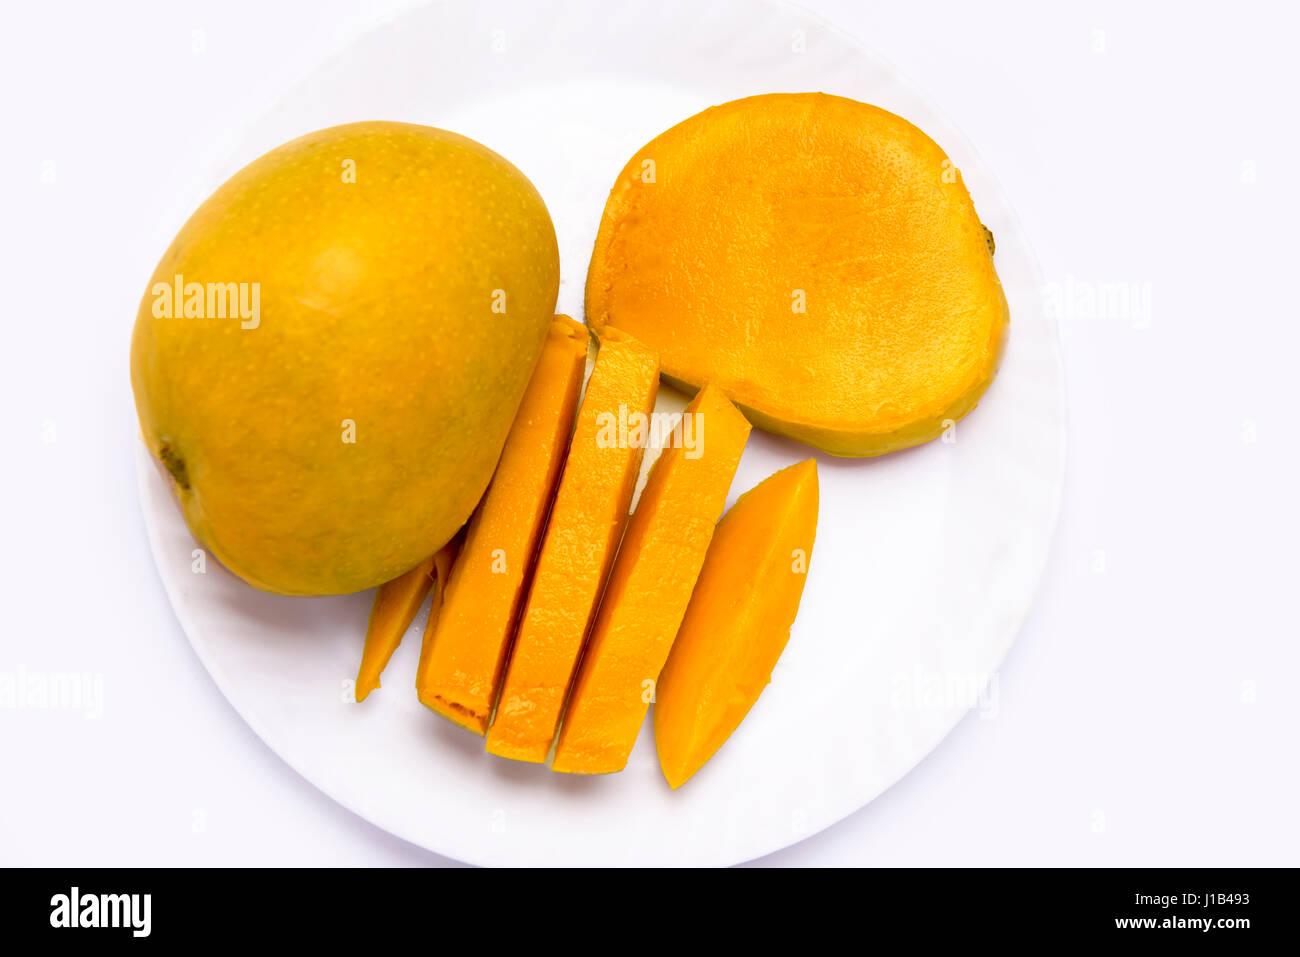 mumbai india 12 april 2017 mango fruit cubes slices on the plate and J1B493